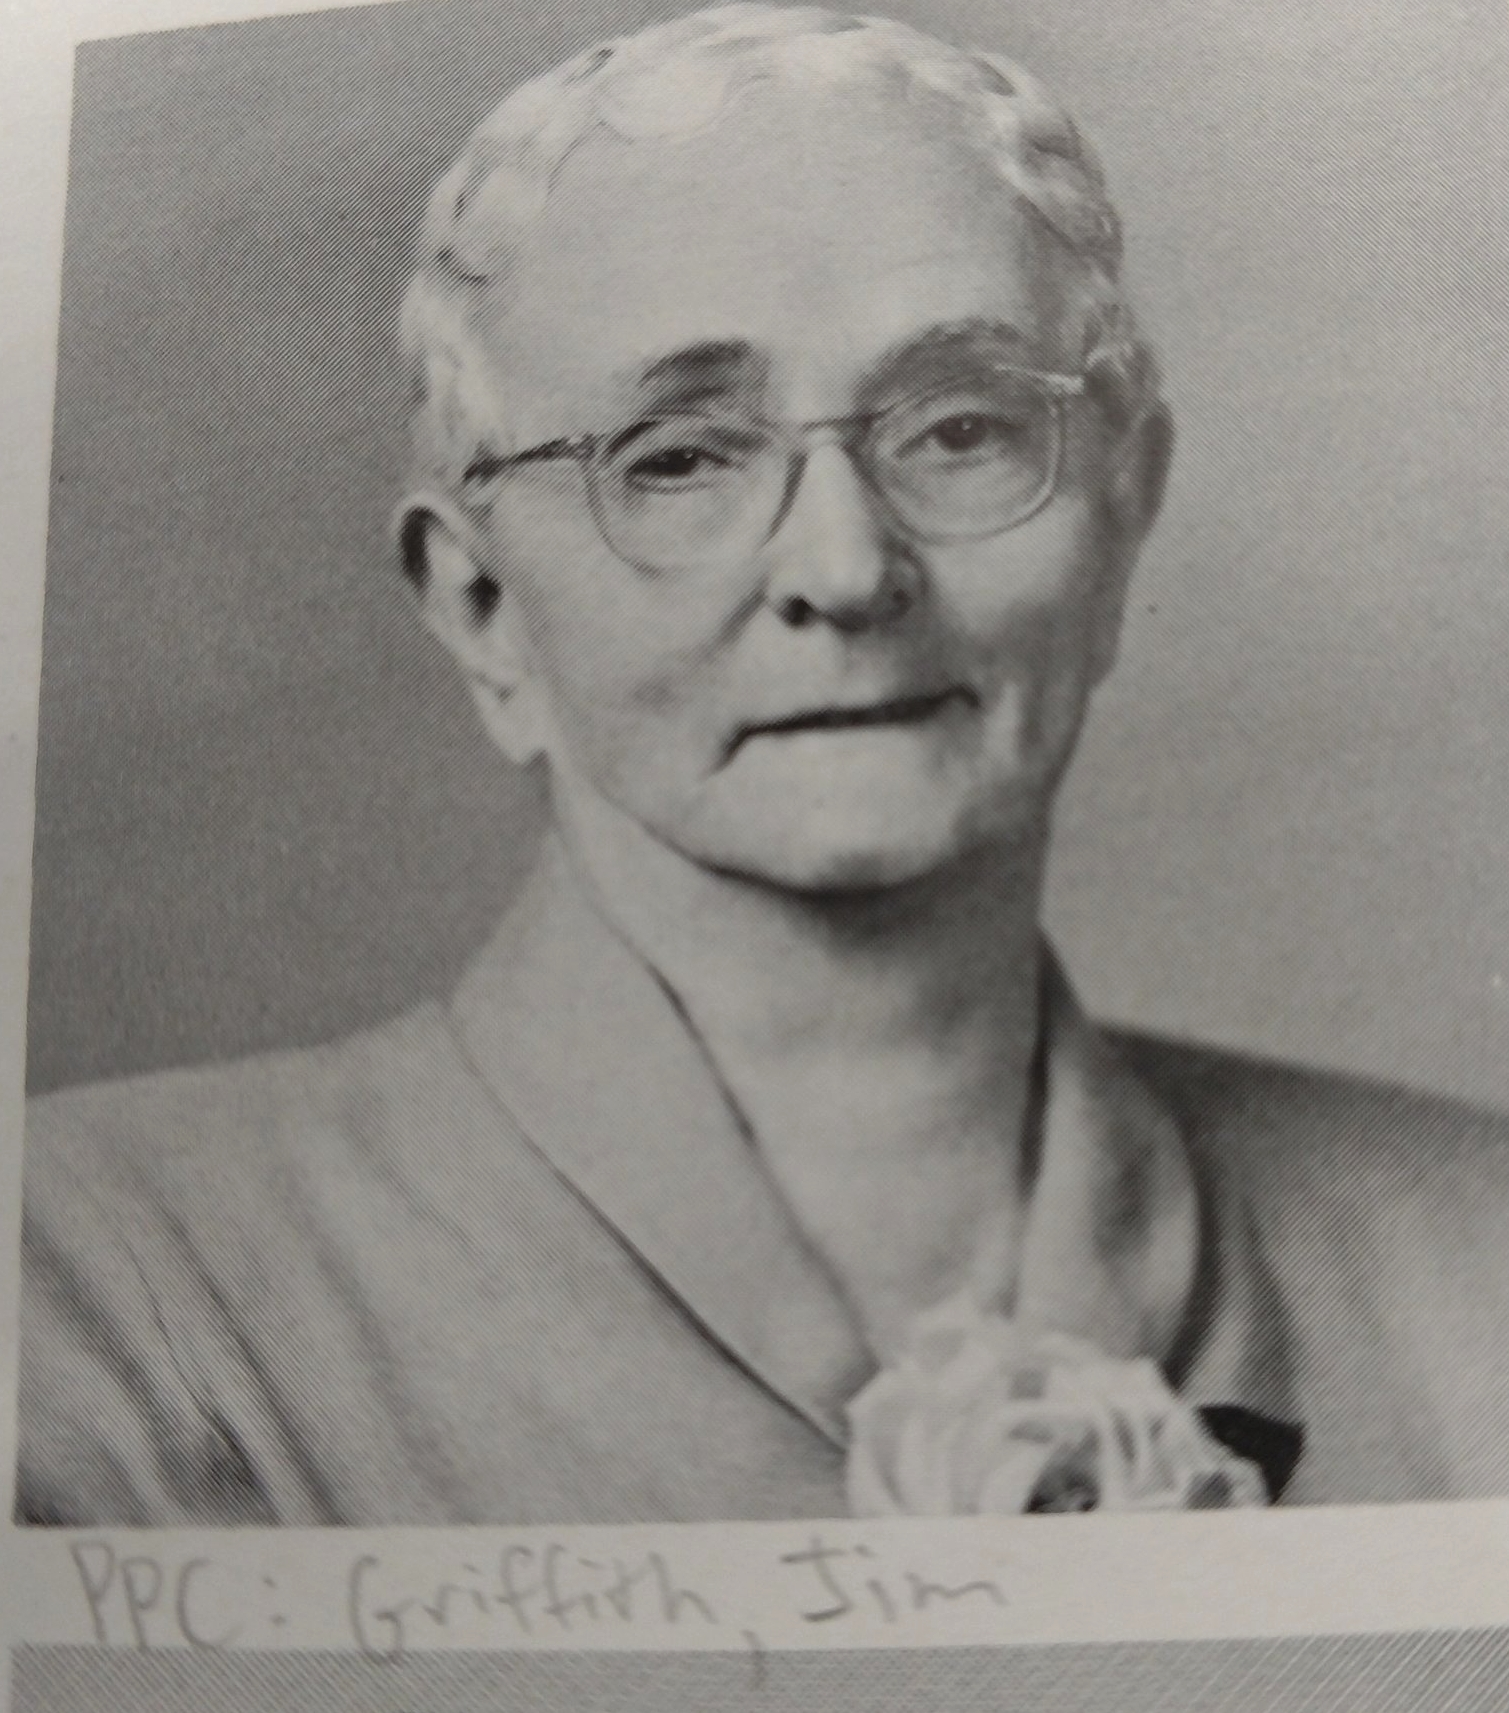 Ma Griffith 1936- 1961